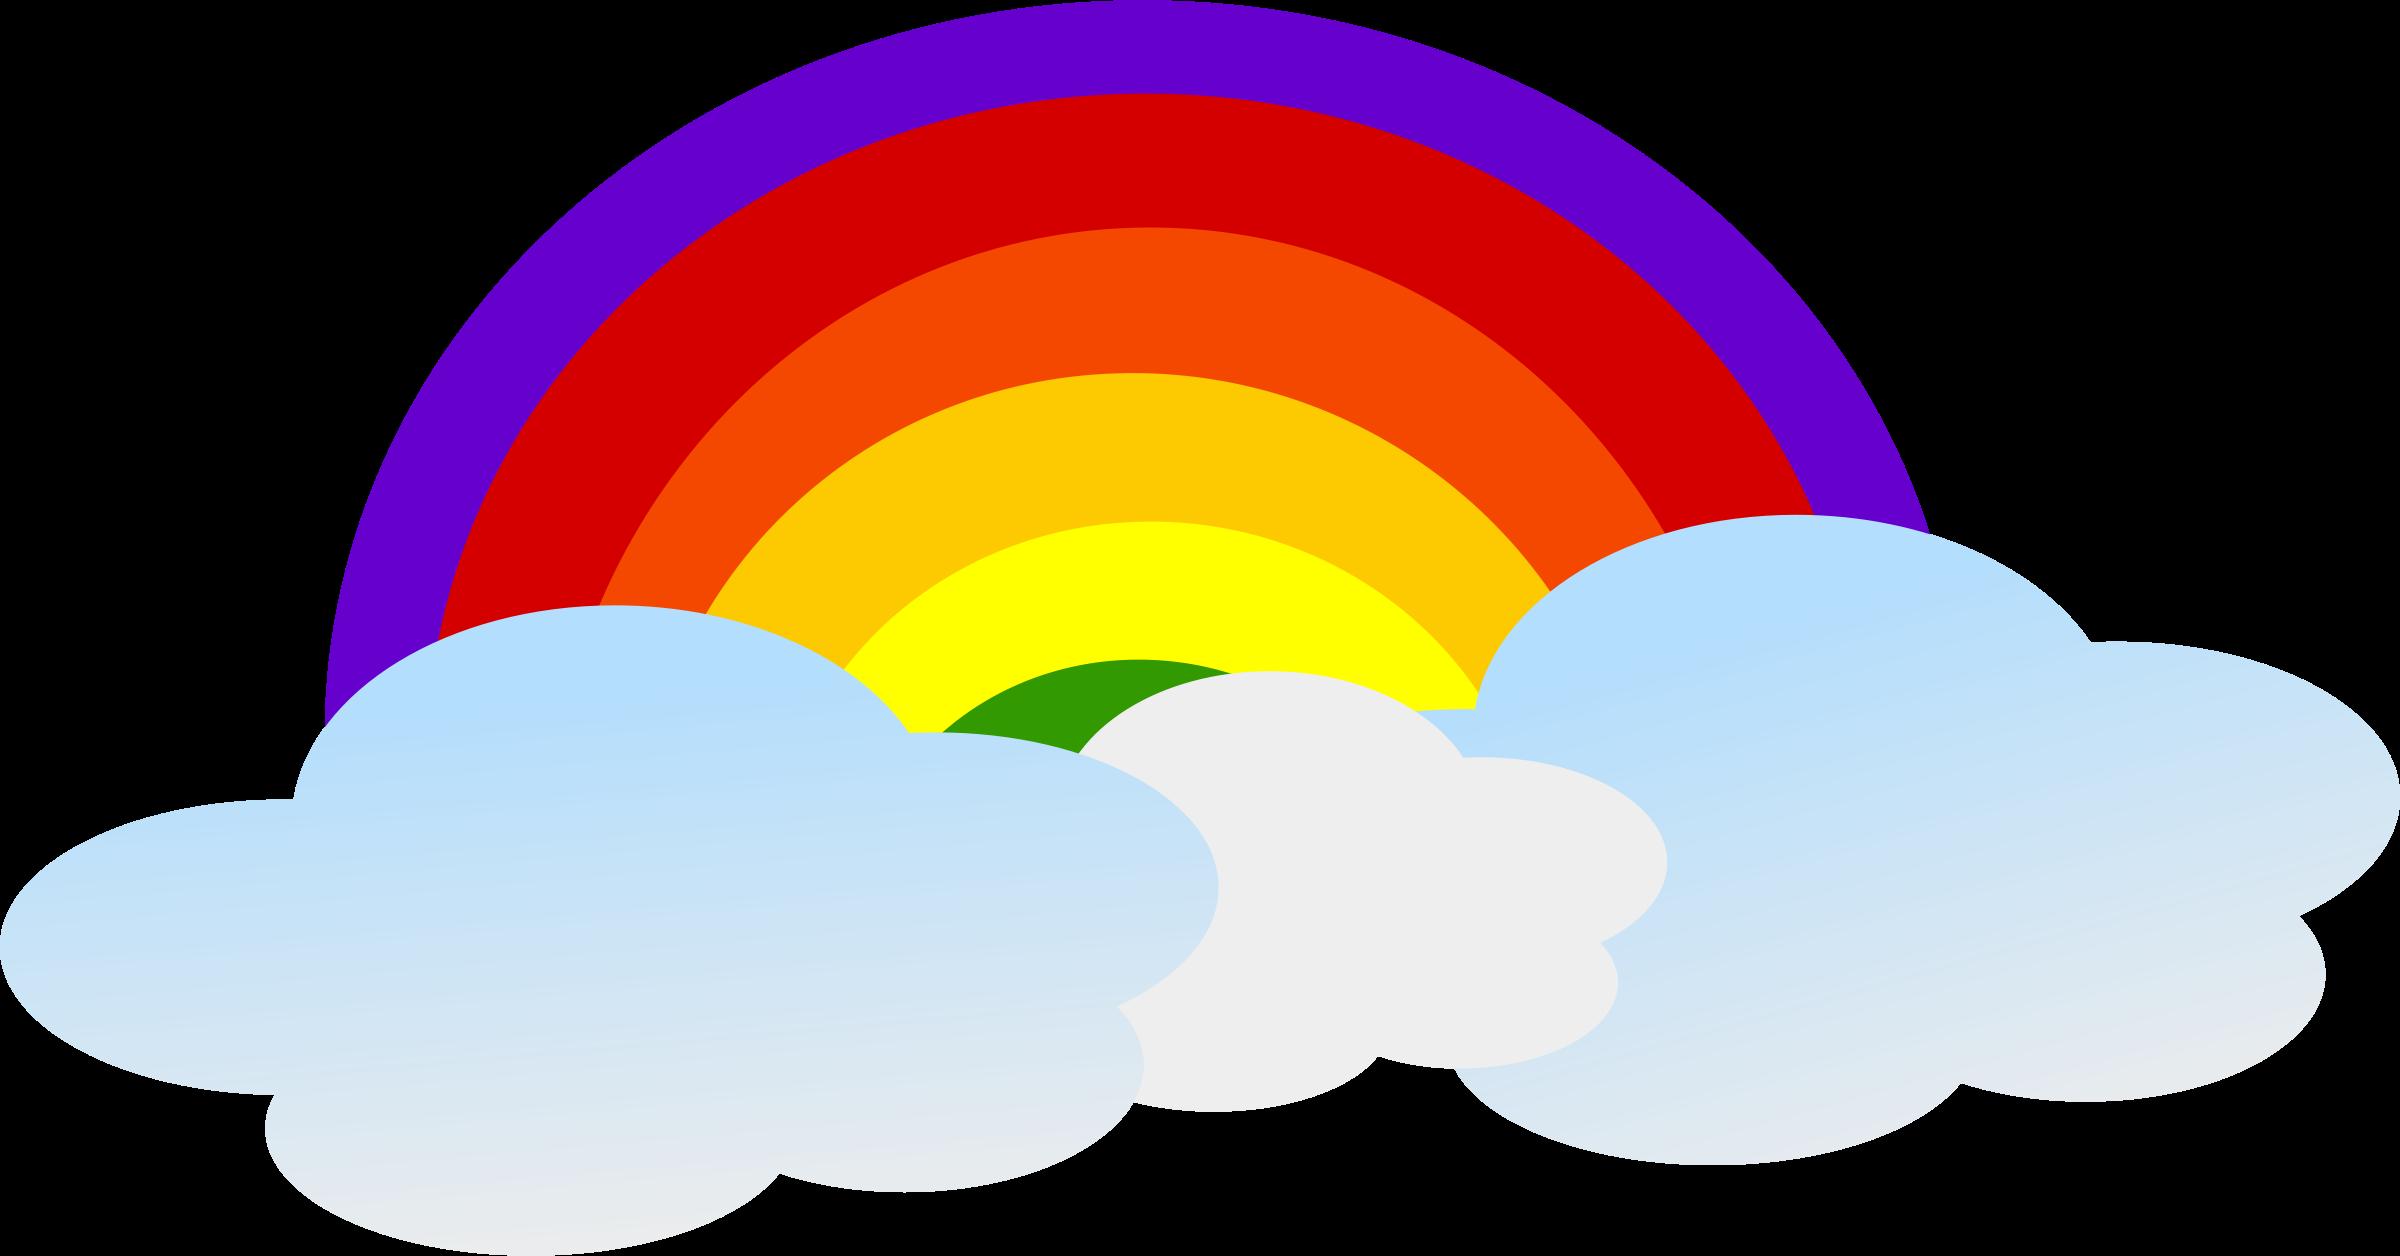 transparent decoration png. Clipart rainbow weather